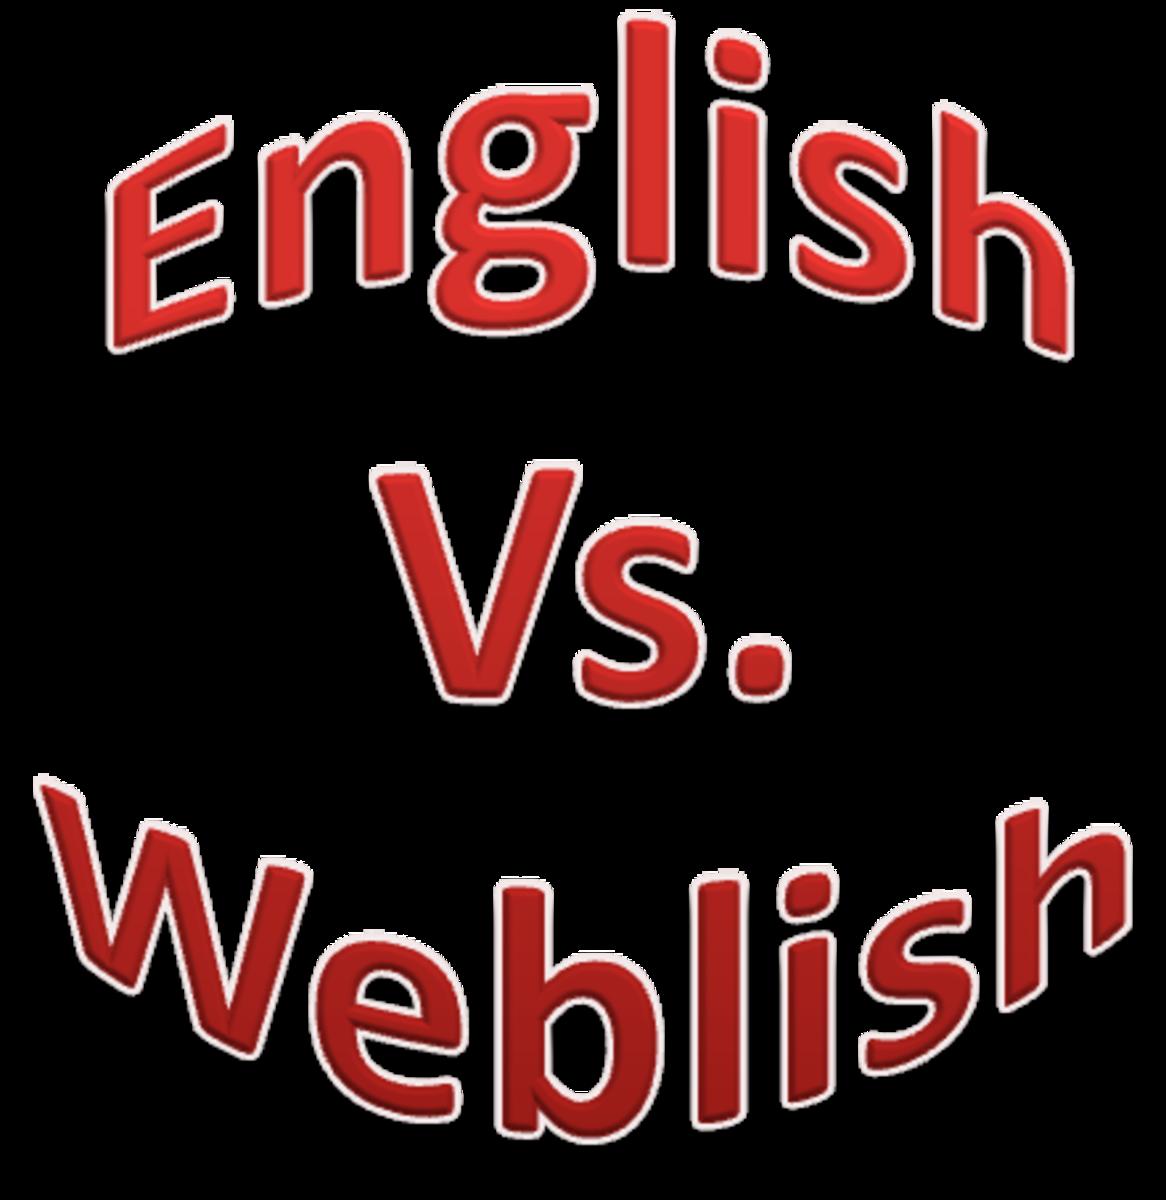 the-future-of-english-and-weblish-internet